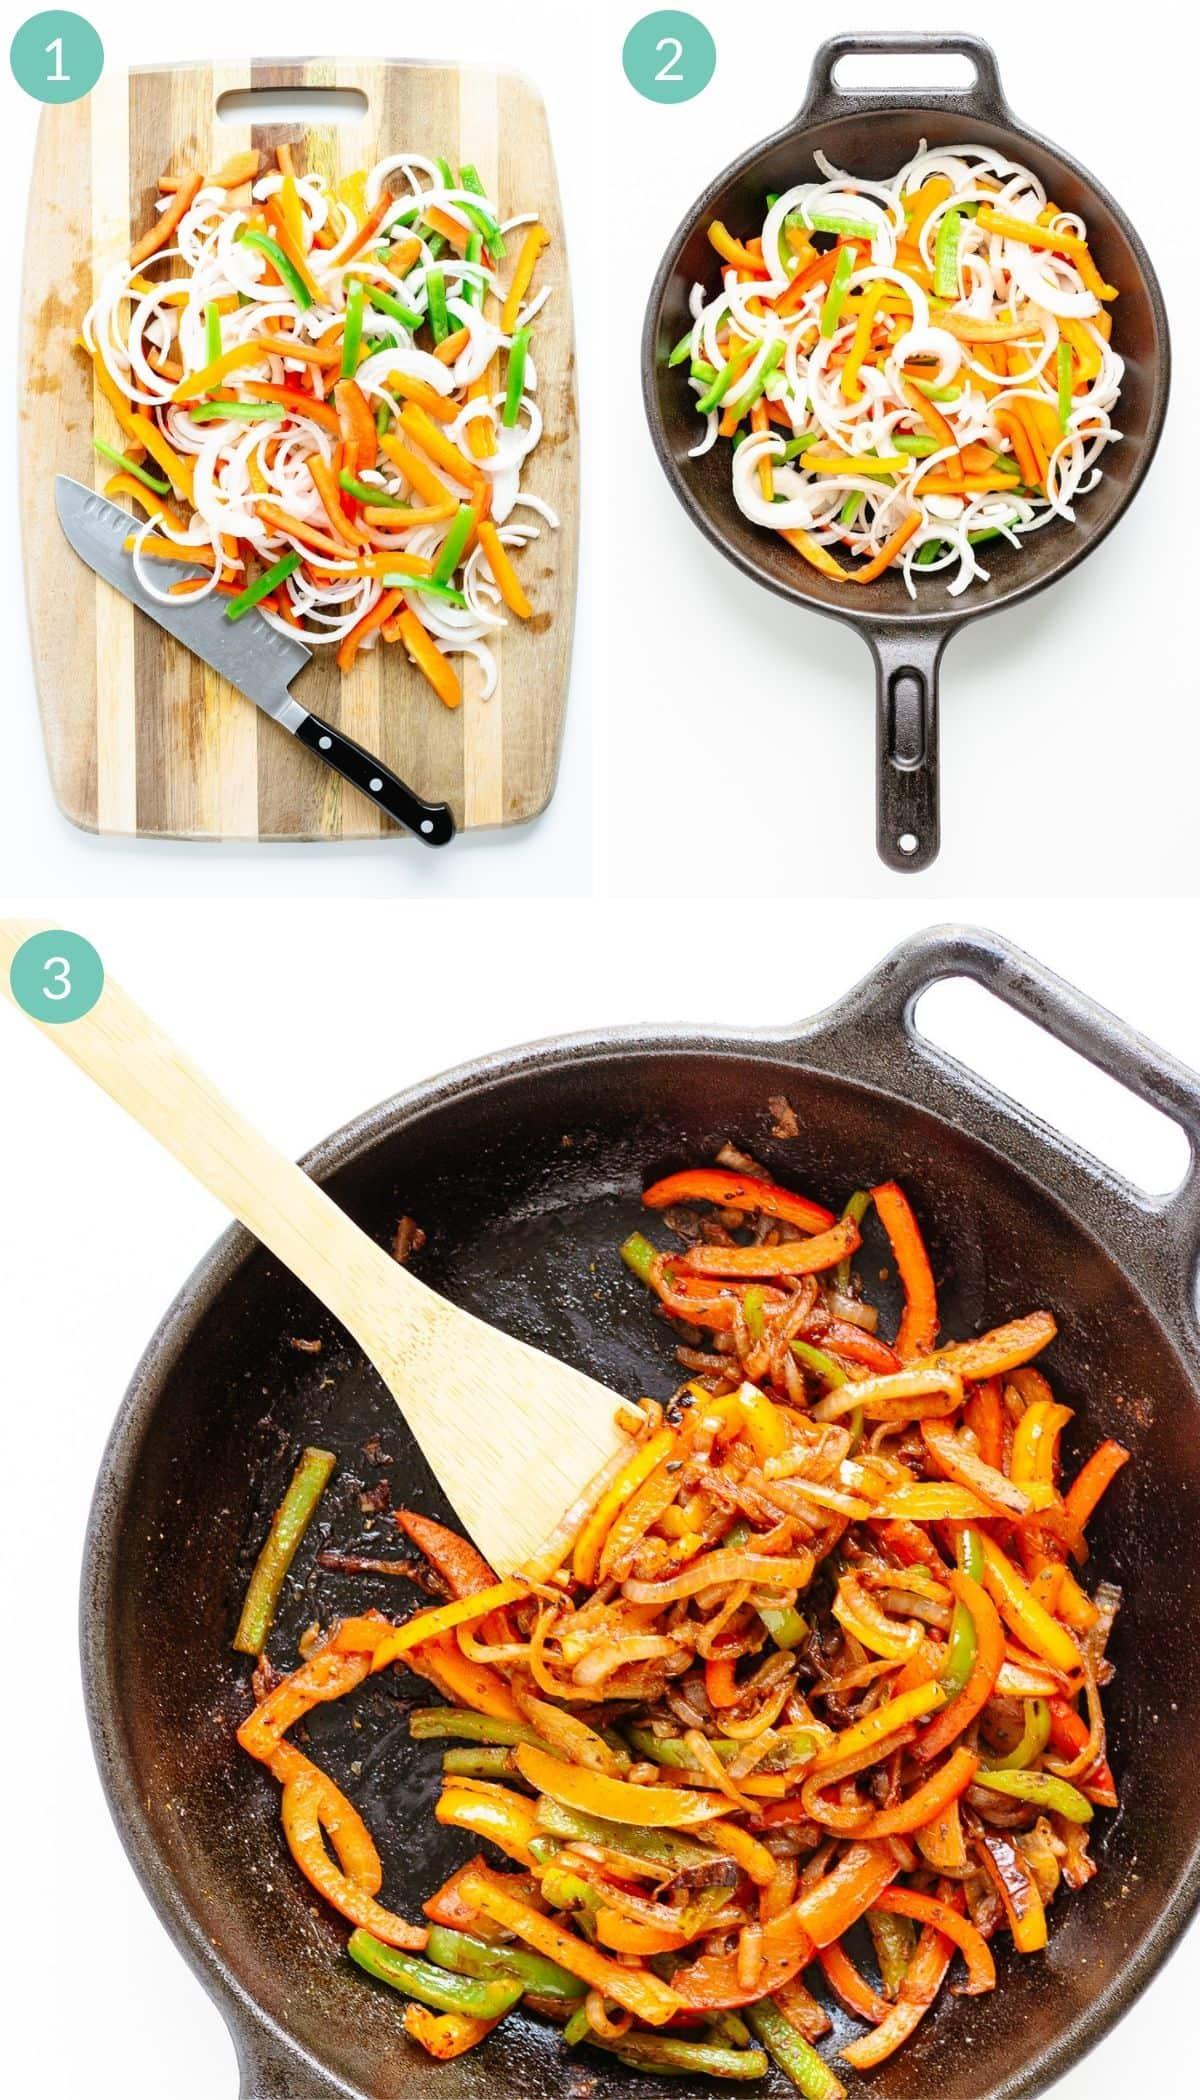 Photo collage showing step-by-step how to make fajita veggies.